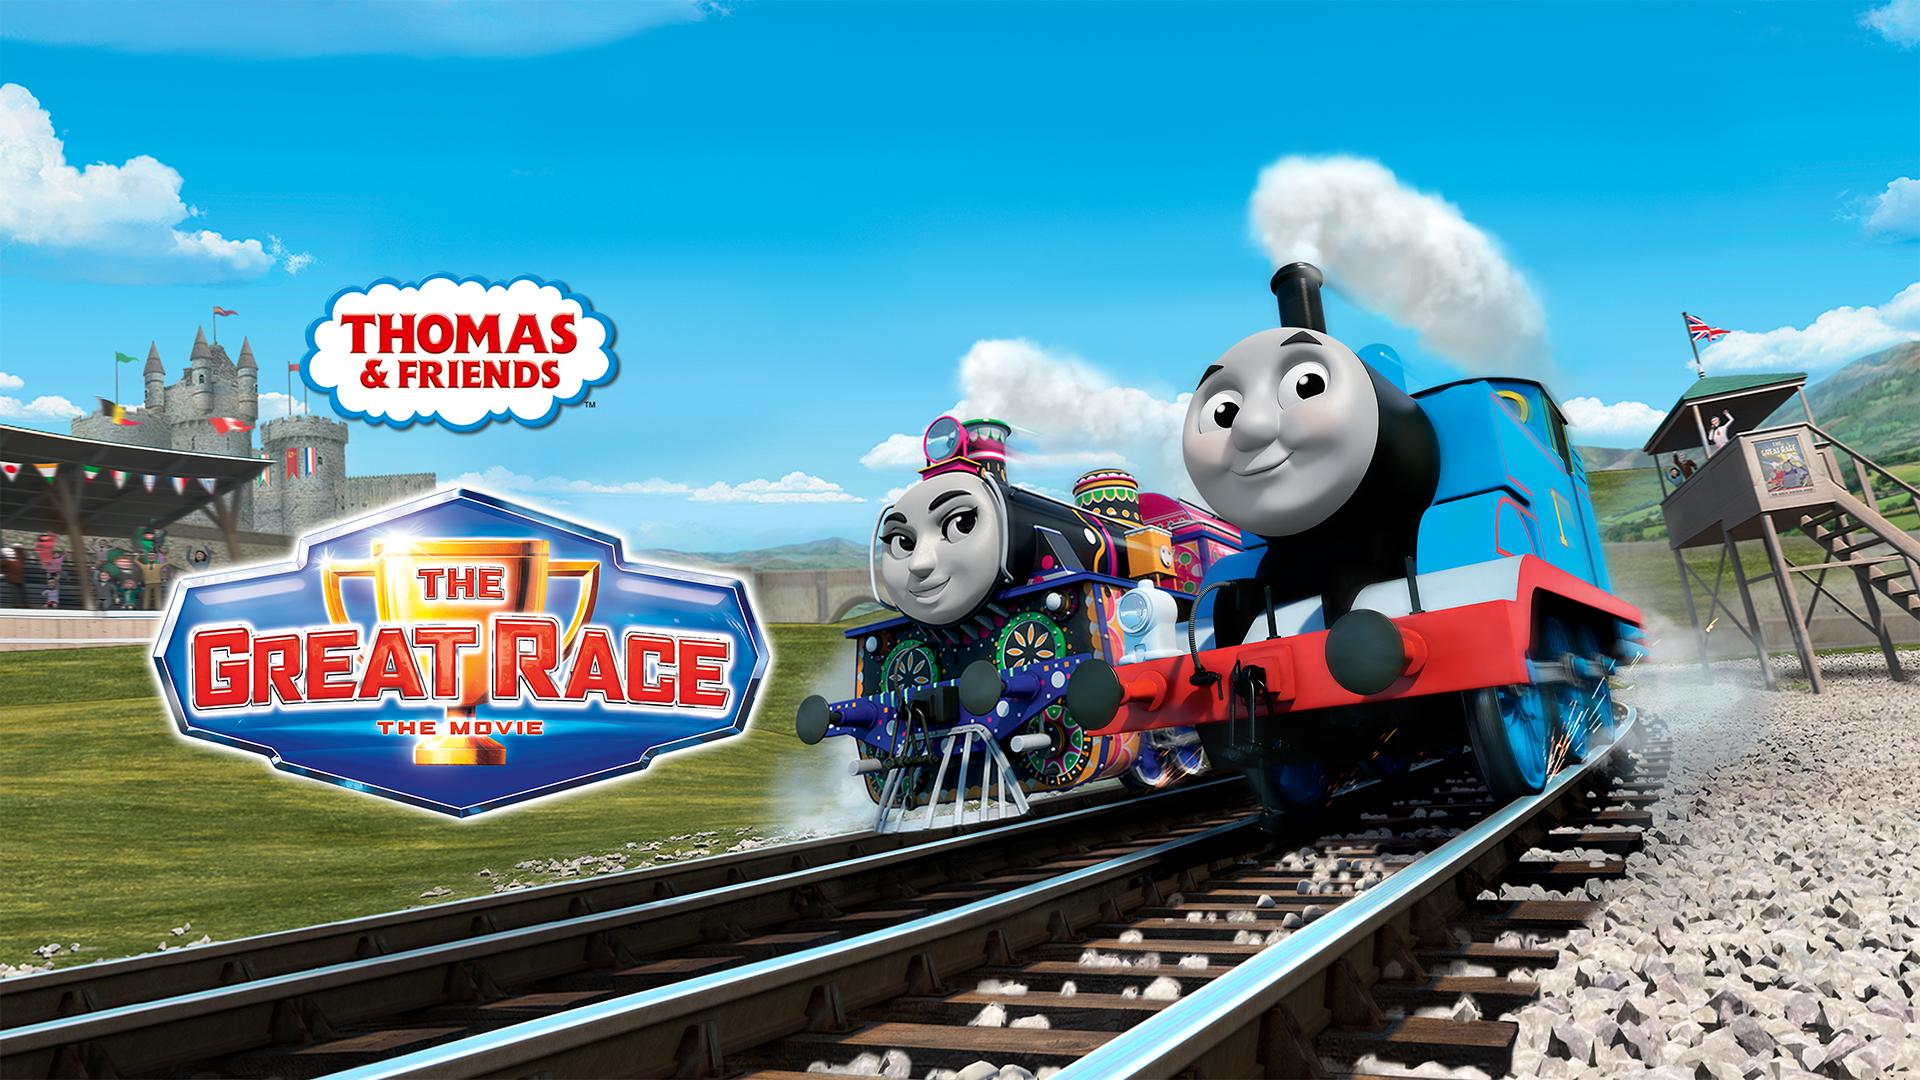 Thomas & Friends: The Great Race (US English, Brazilian Portuguese, Latin America Spanish)